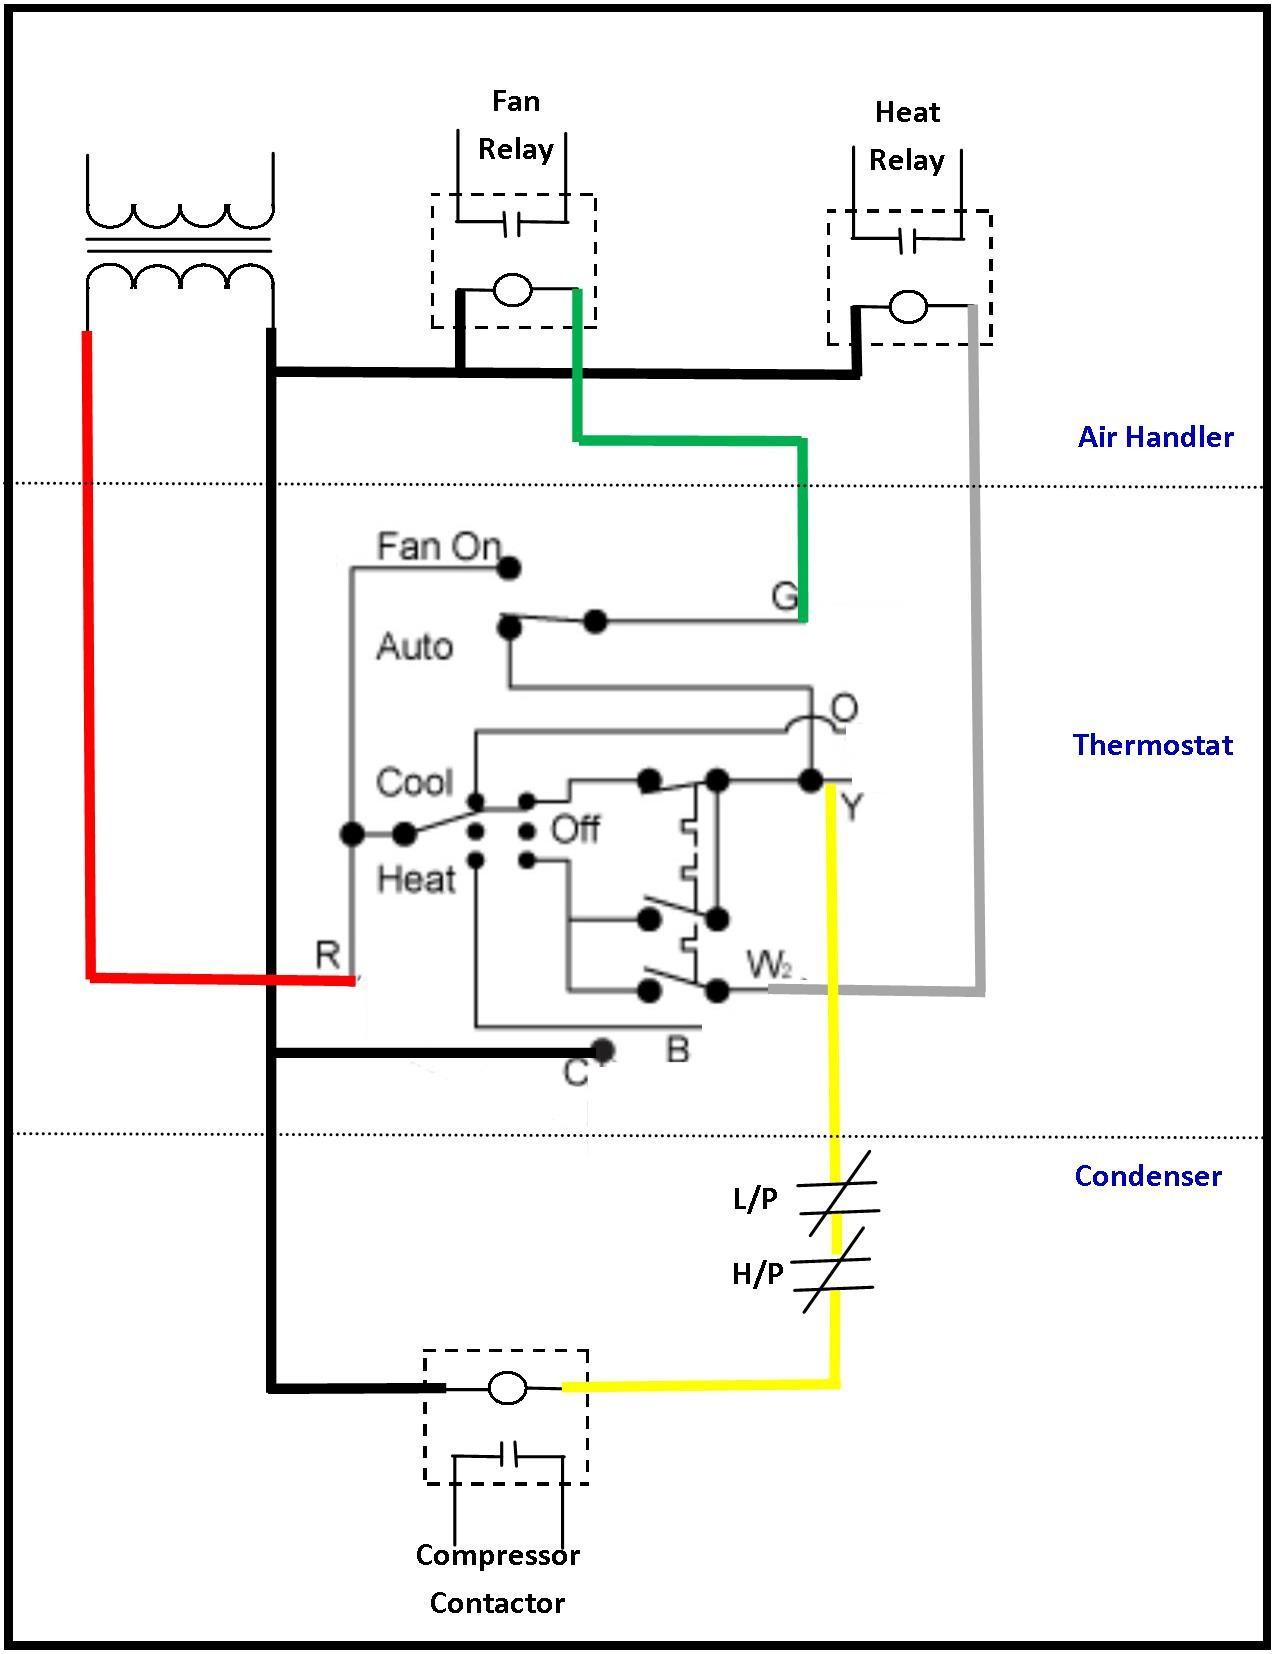 Ac Hvac Wiring - Wiring Diagram Data Oreo - Ac Thermostat Wiring Diagram